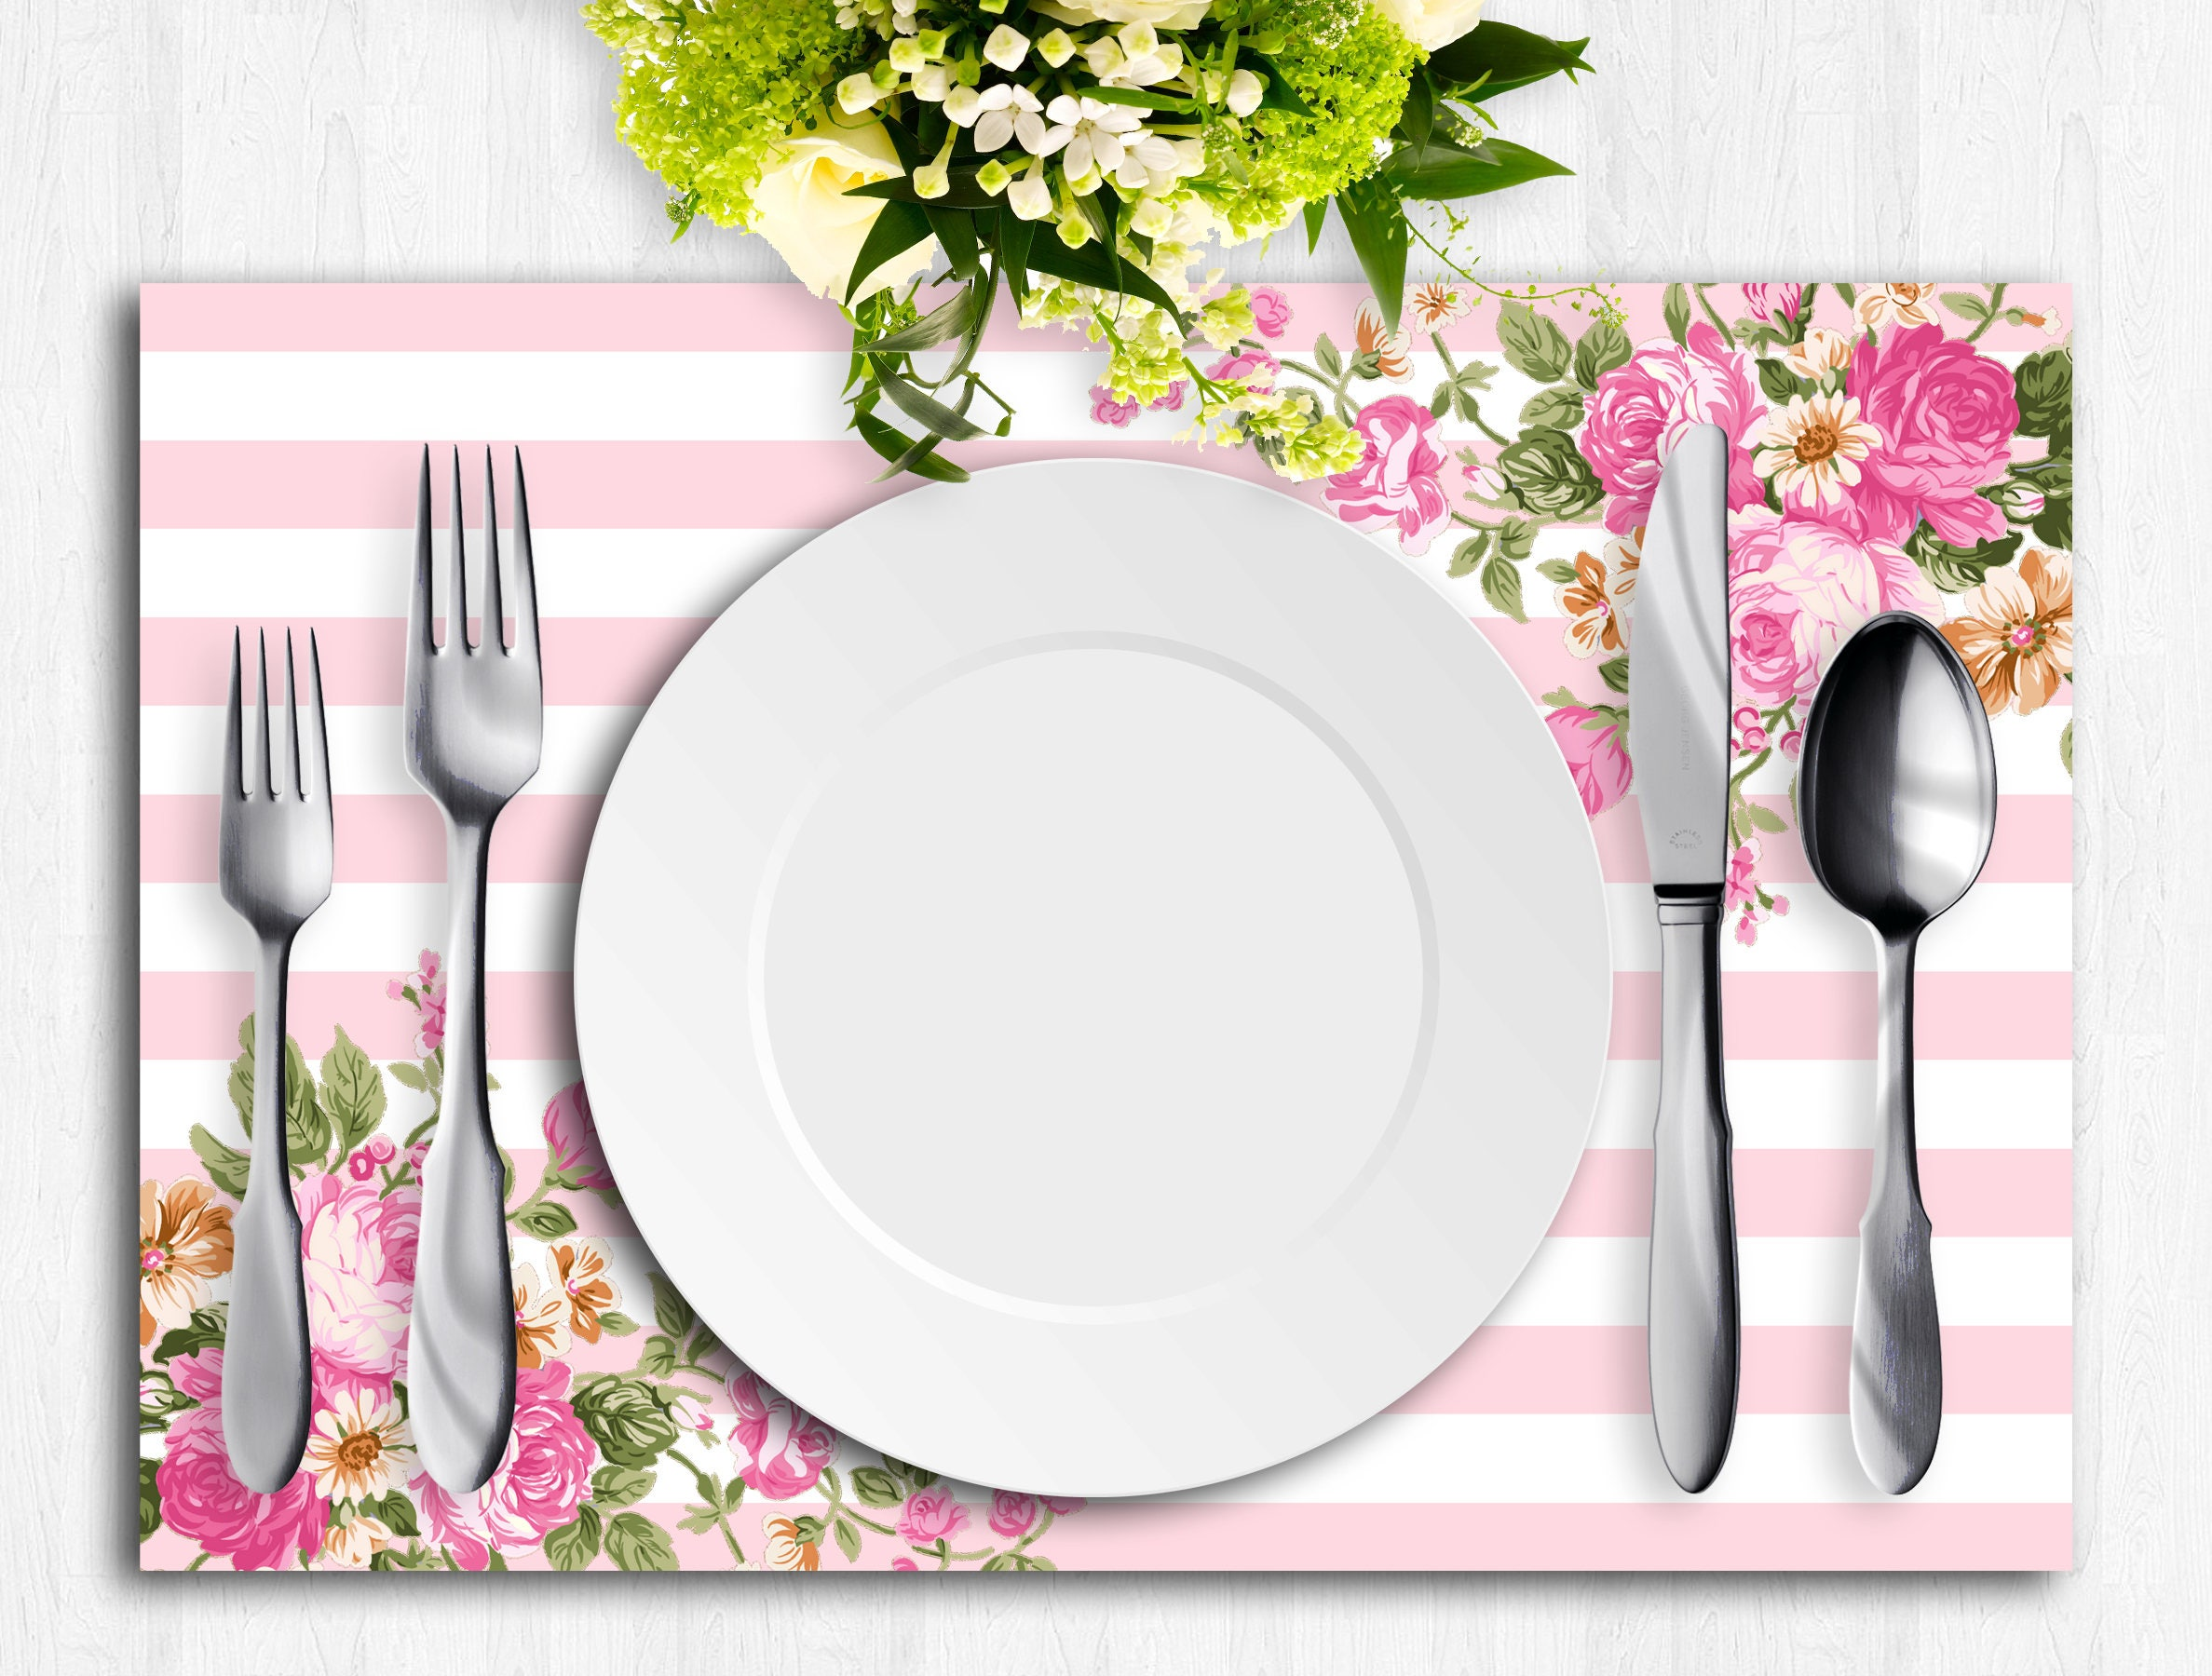 Pink Paper Placemat Printable Placemat Bridal Wedding Etsy